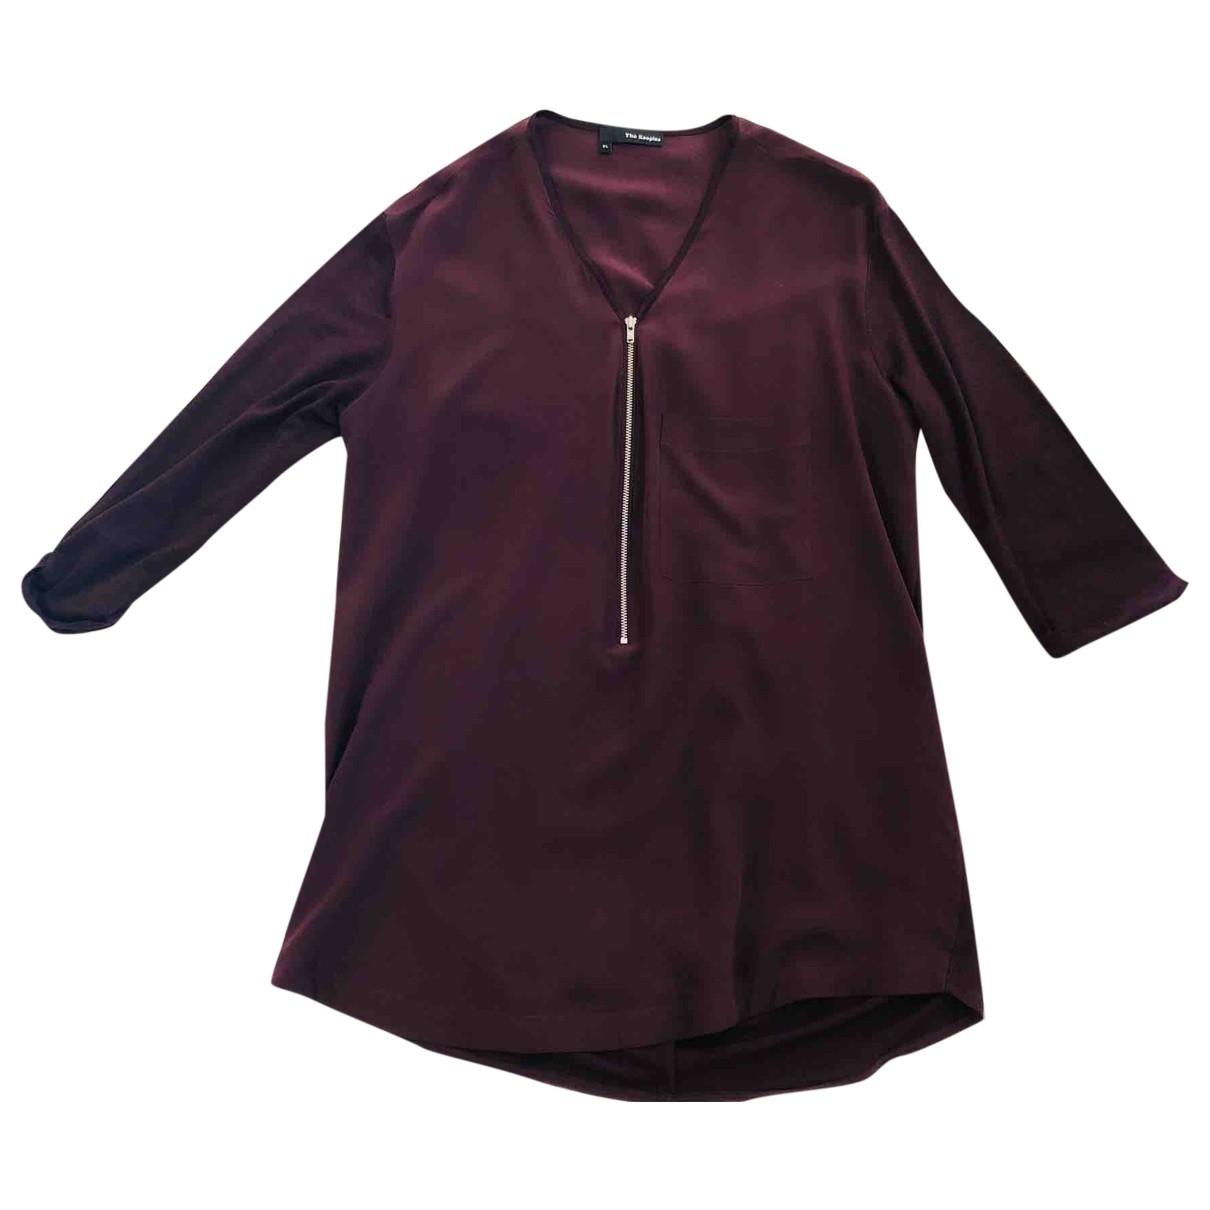 The Kooples \N Burgundy Silk  top for Women XL International